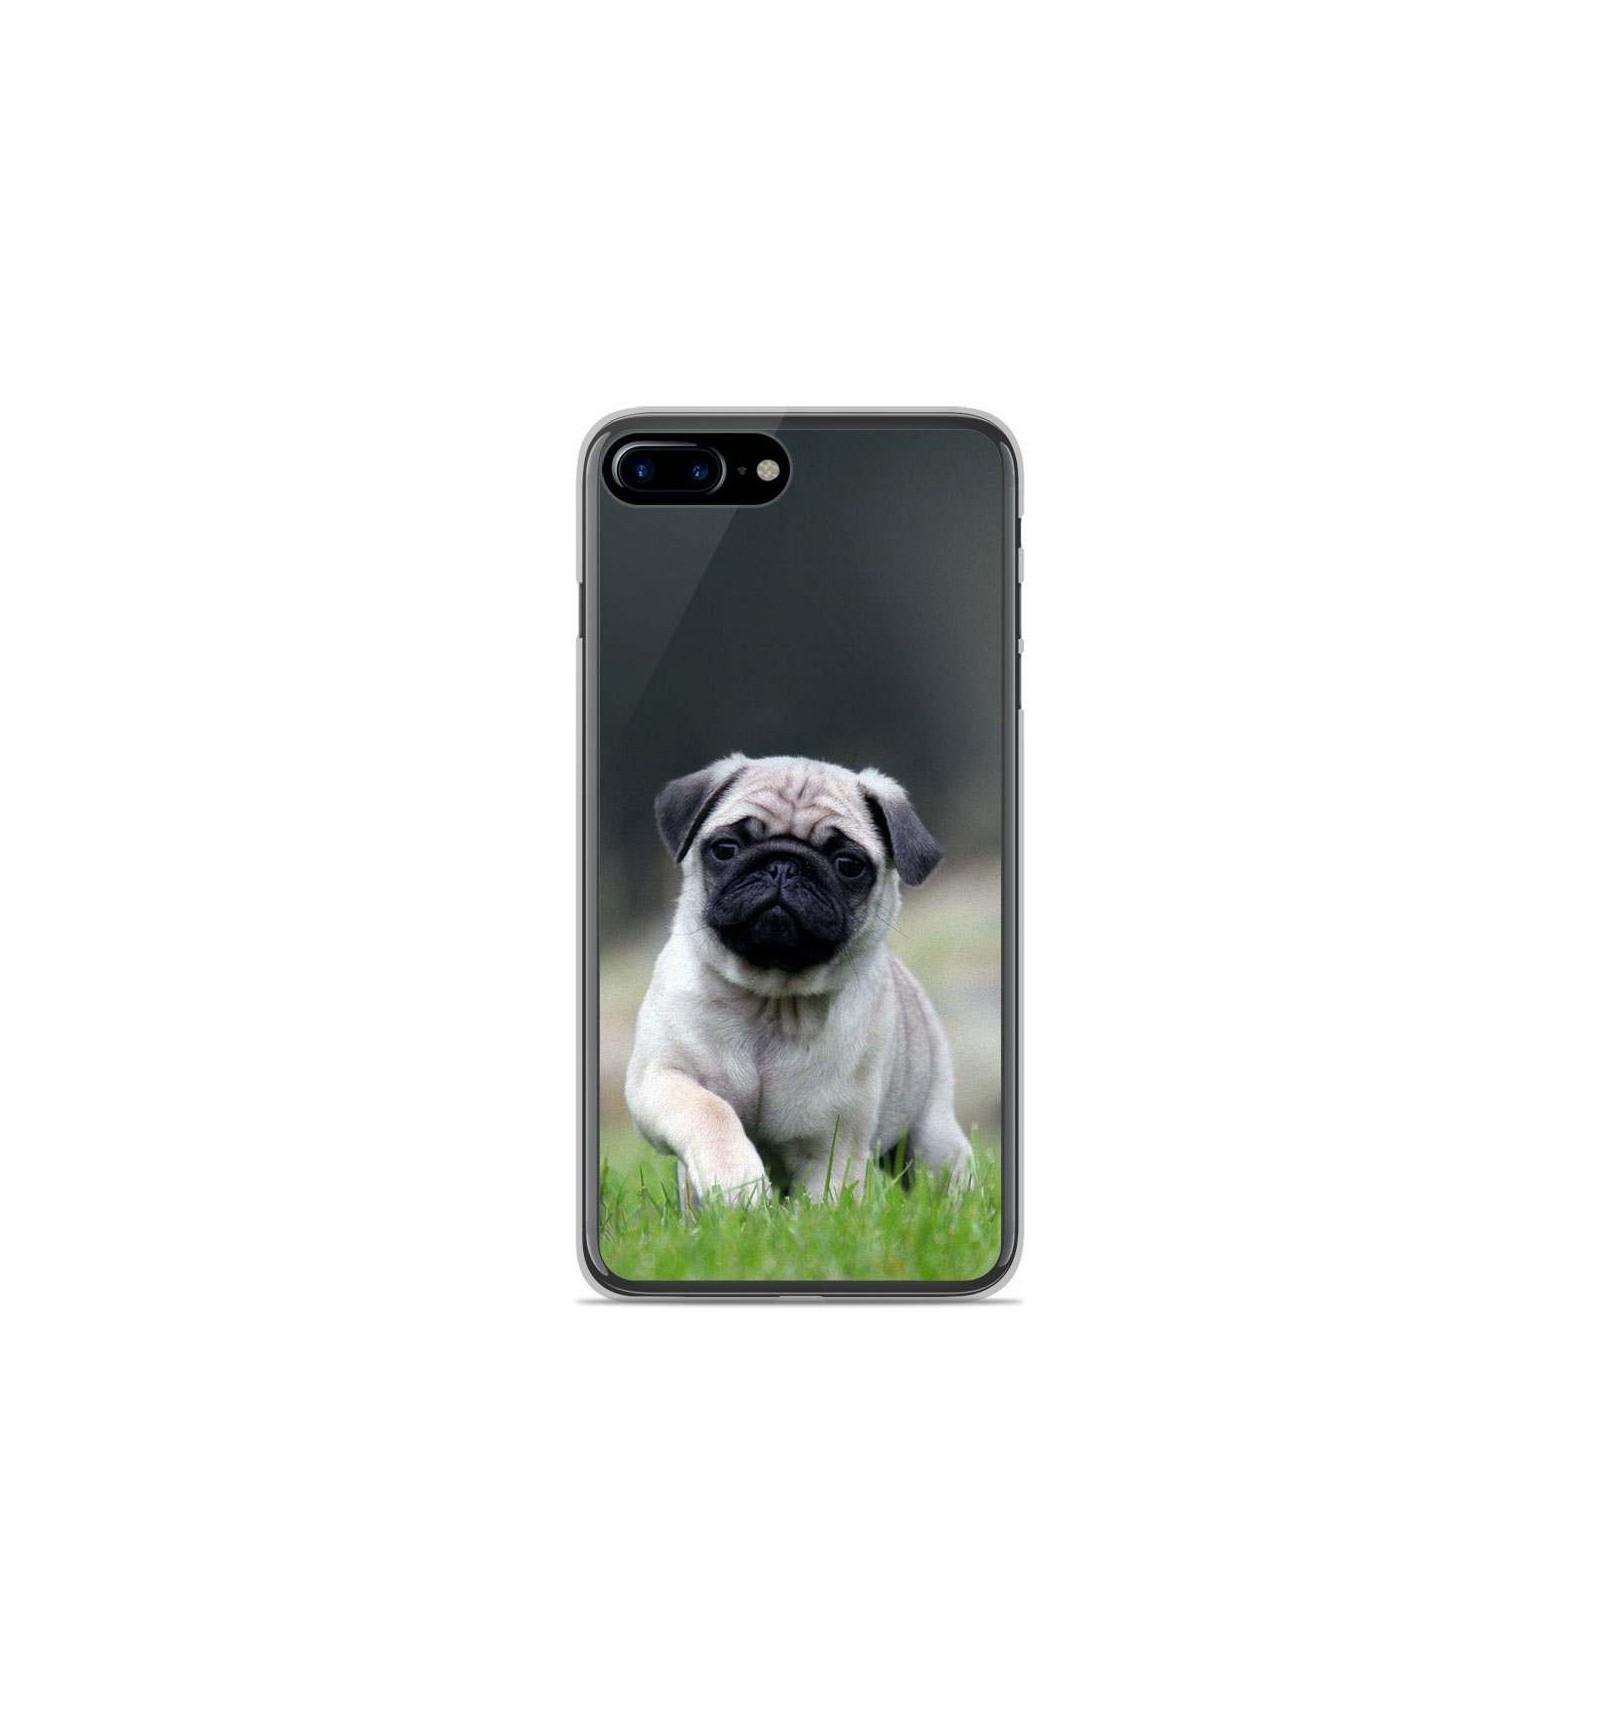 coque iphone 8 plus bouledogue francais